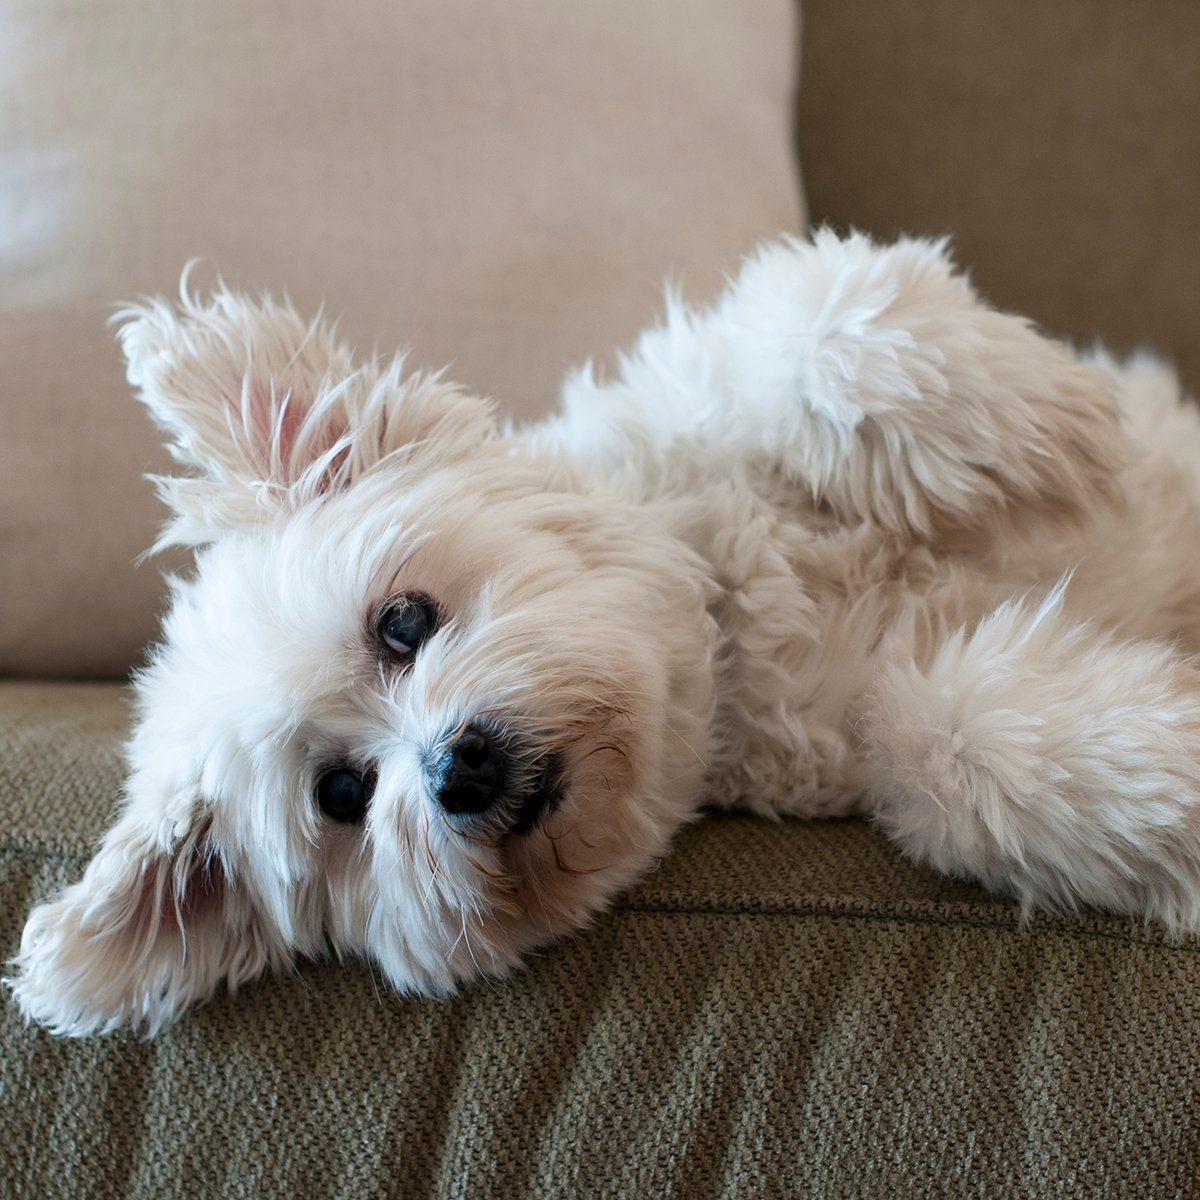 Fluffy white dog laying on lounge